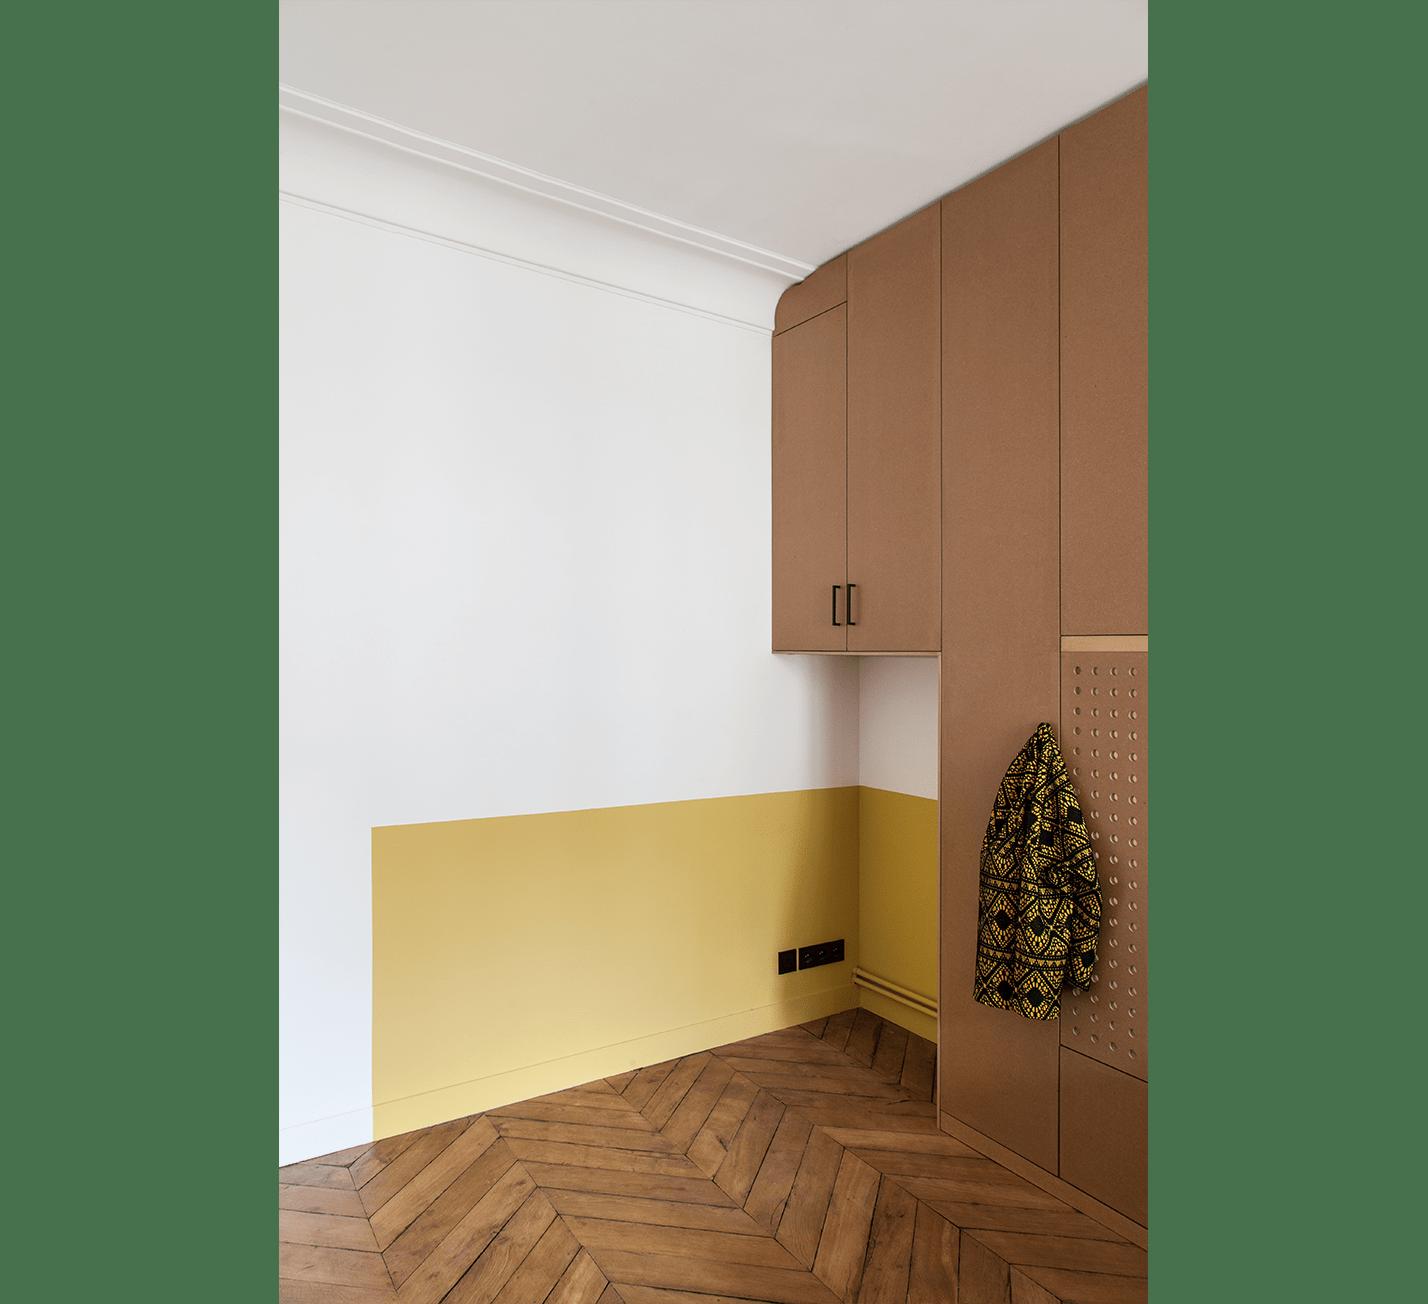 Projet-Jules-Cesar-Atelier-Steve-Pauline-Borgia-Architecte-interieur-08-min